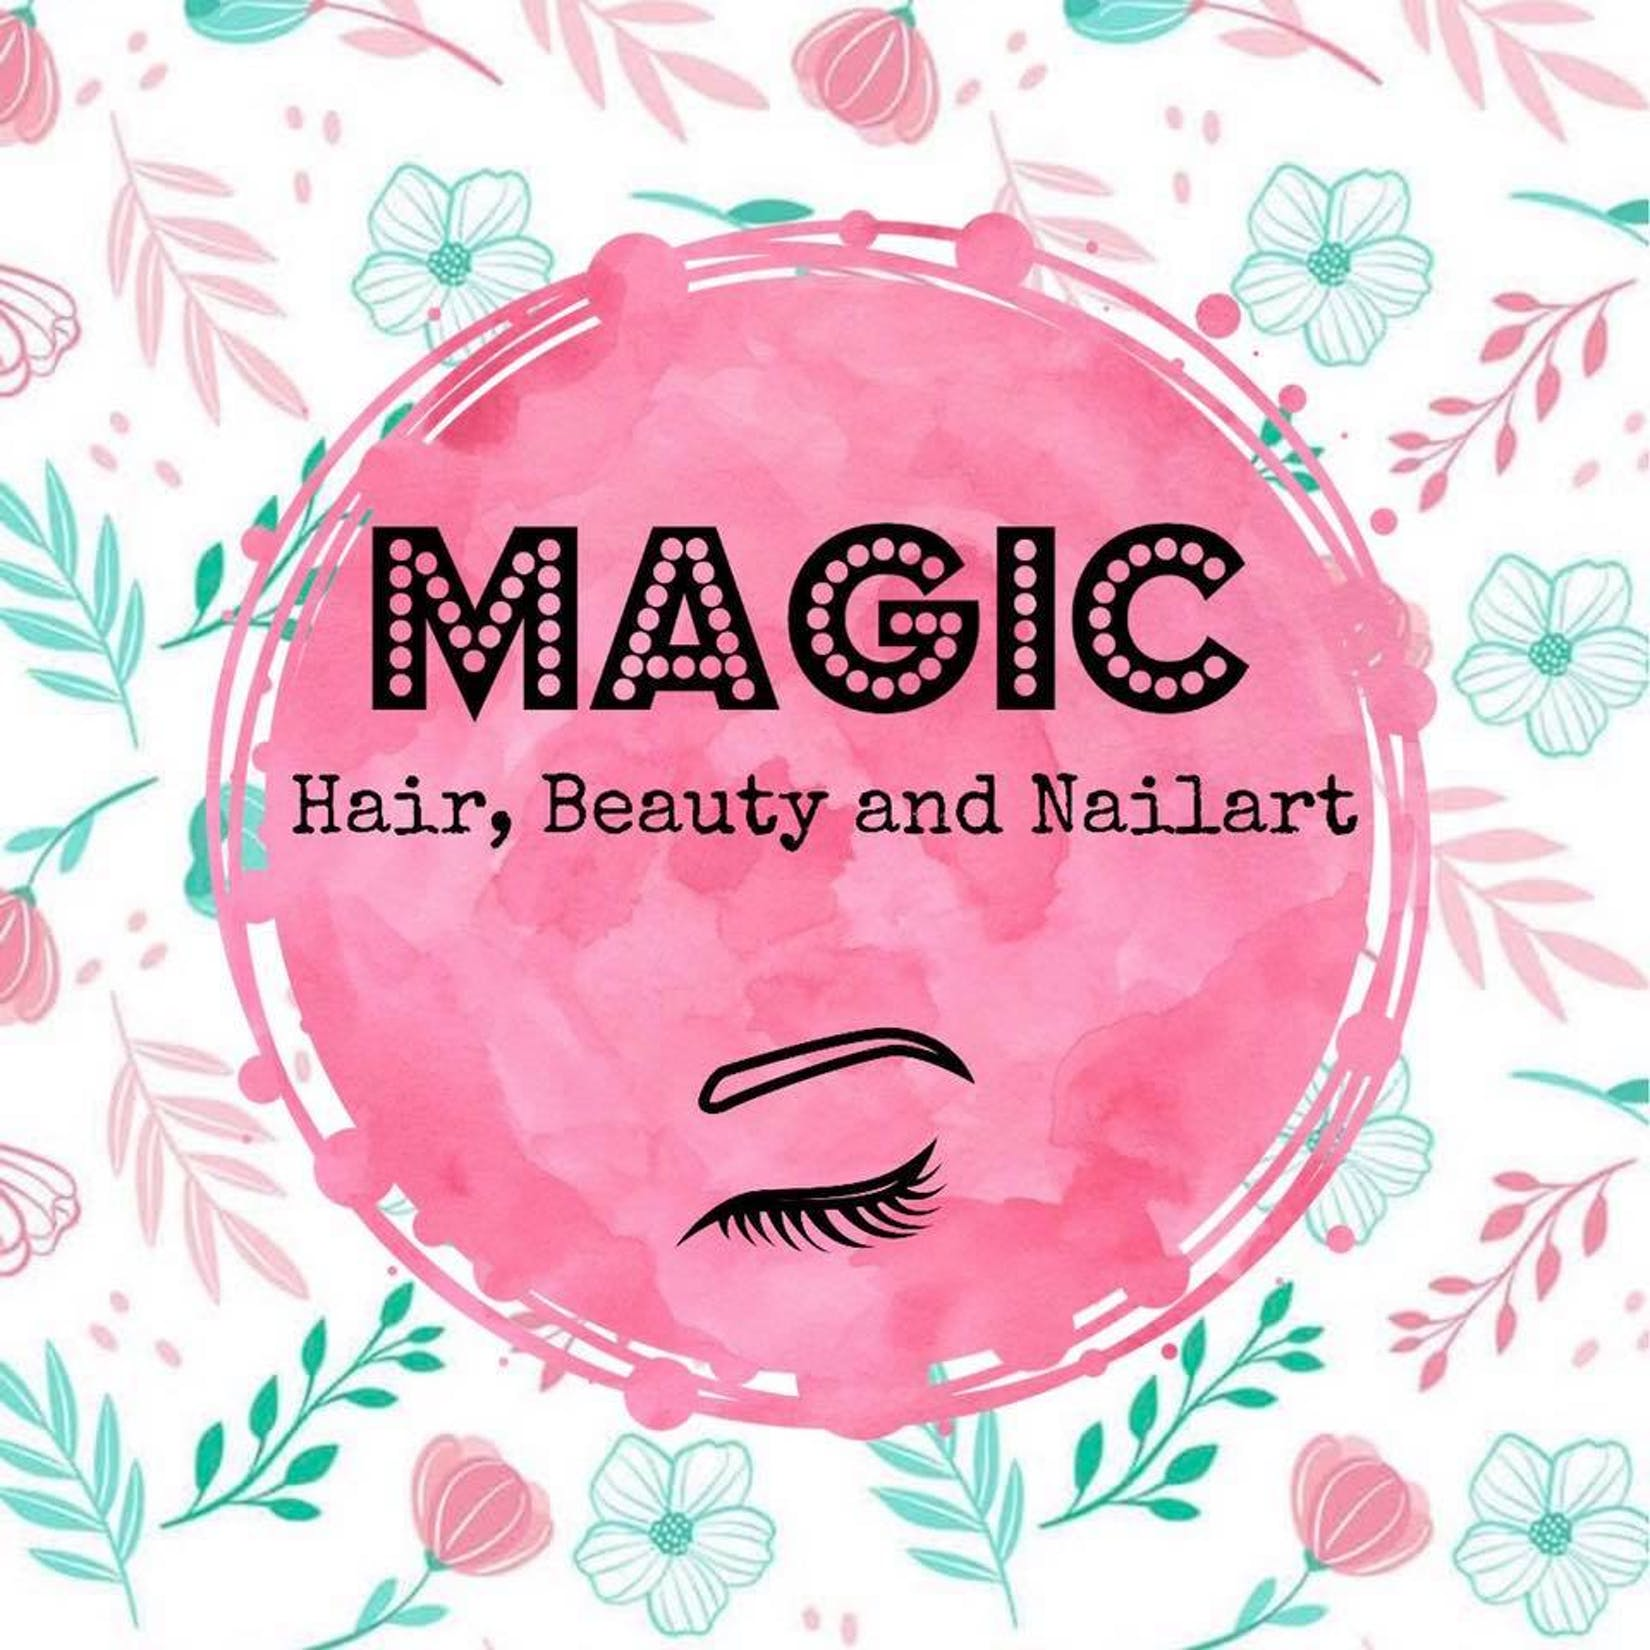 Magic Beauty Salon & Nail Art | Beauty